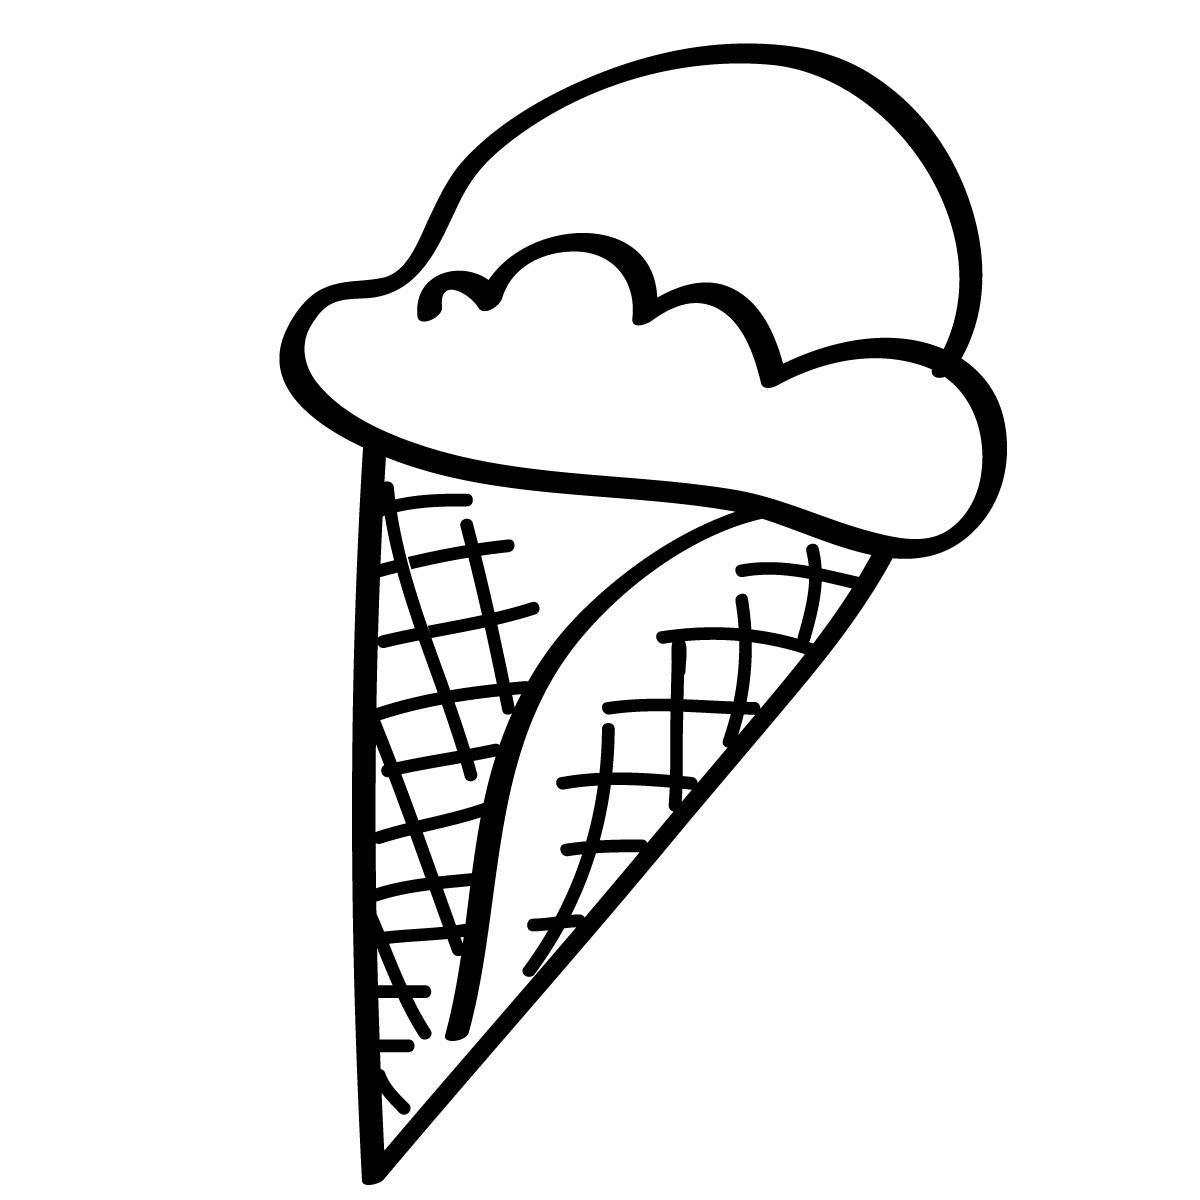 Ice Cream Cone Ice Creamne Clipart Free Clipart Images 2